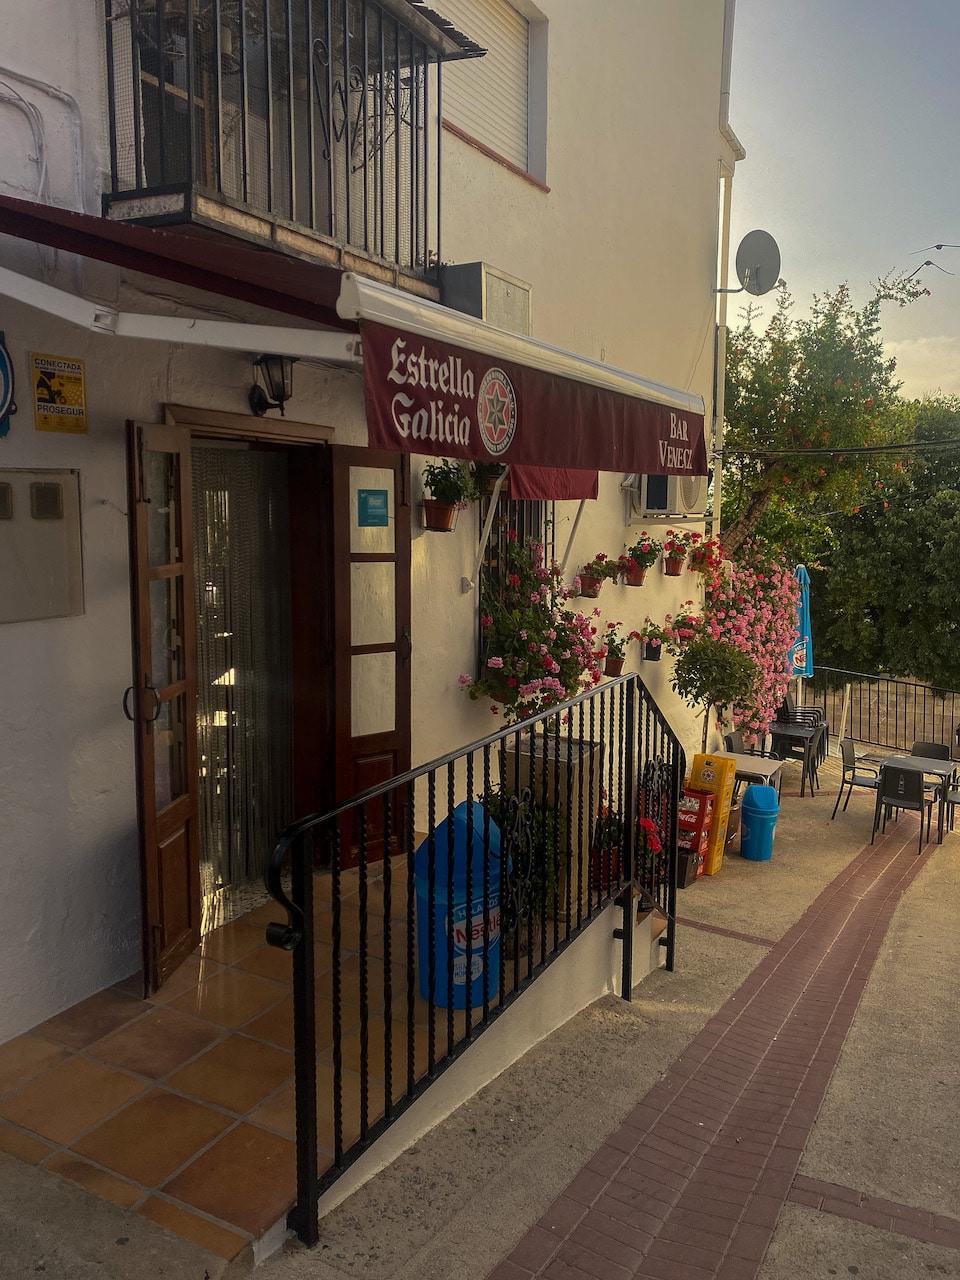 restaurants Lecrin Vallei Spanje